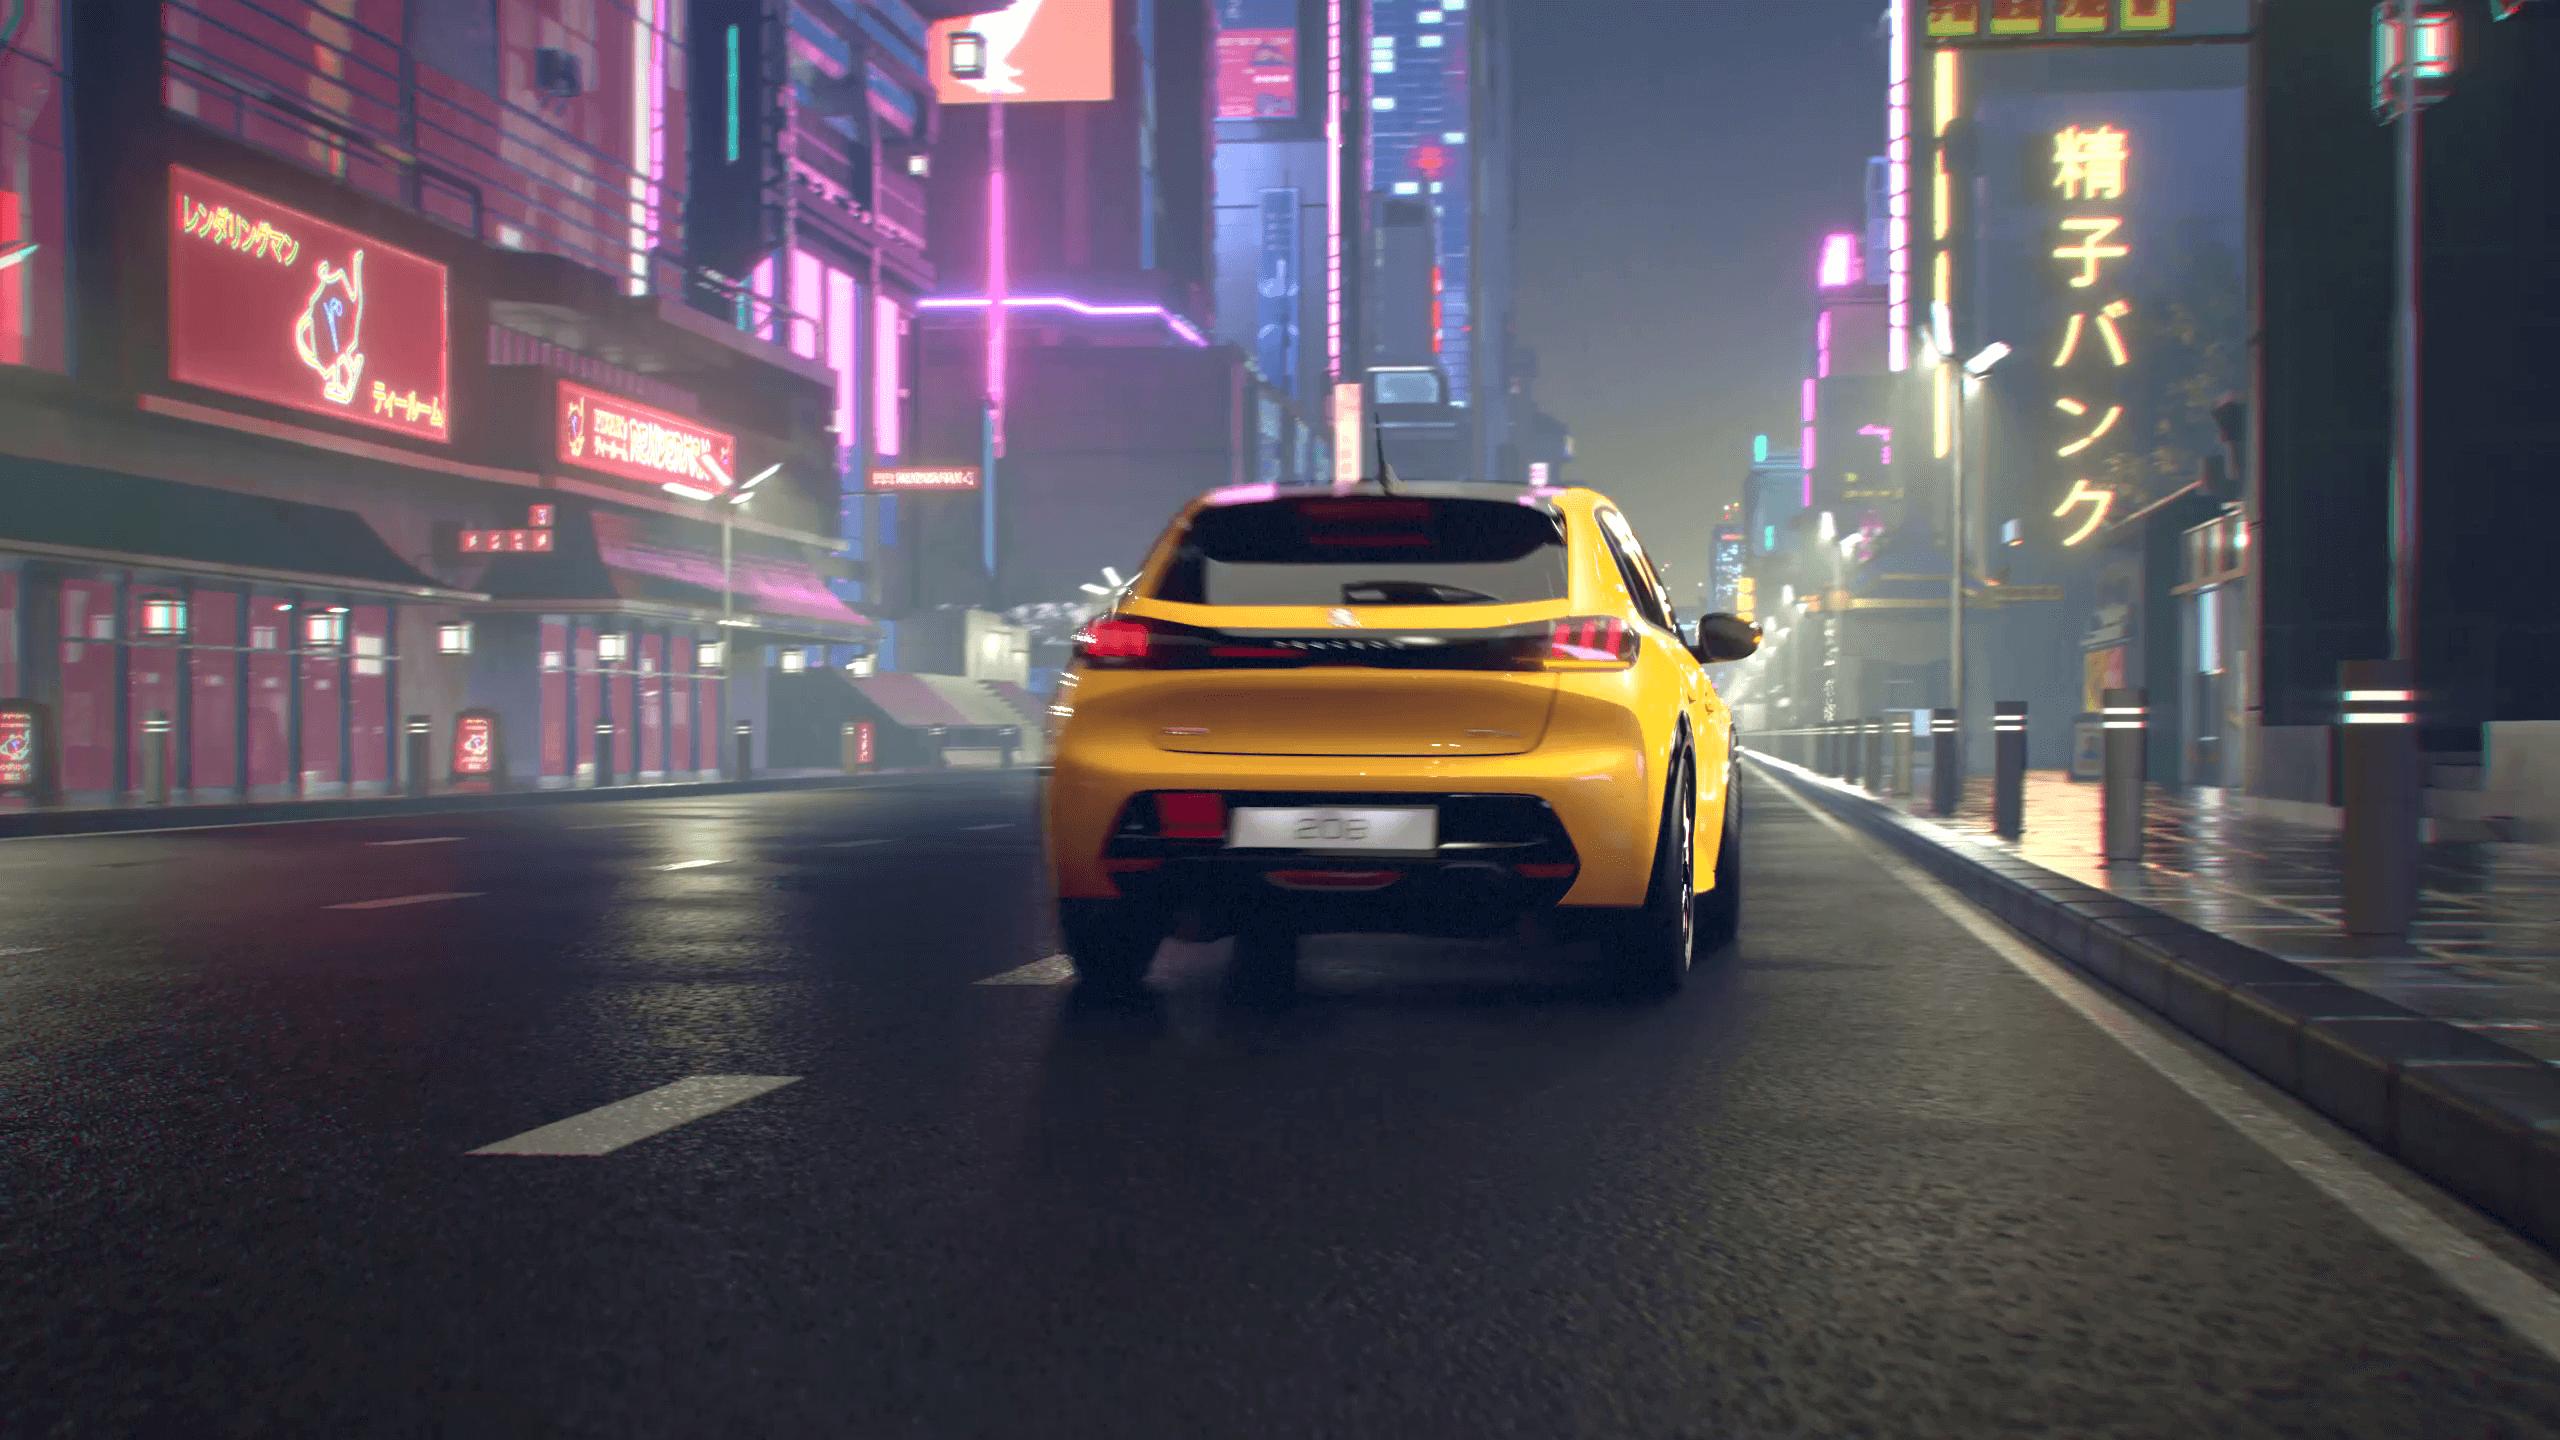 Peugeot-Tokyo-00005